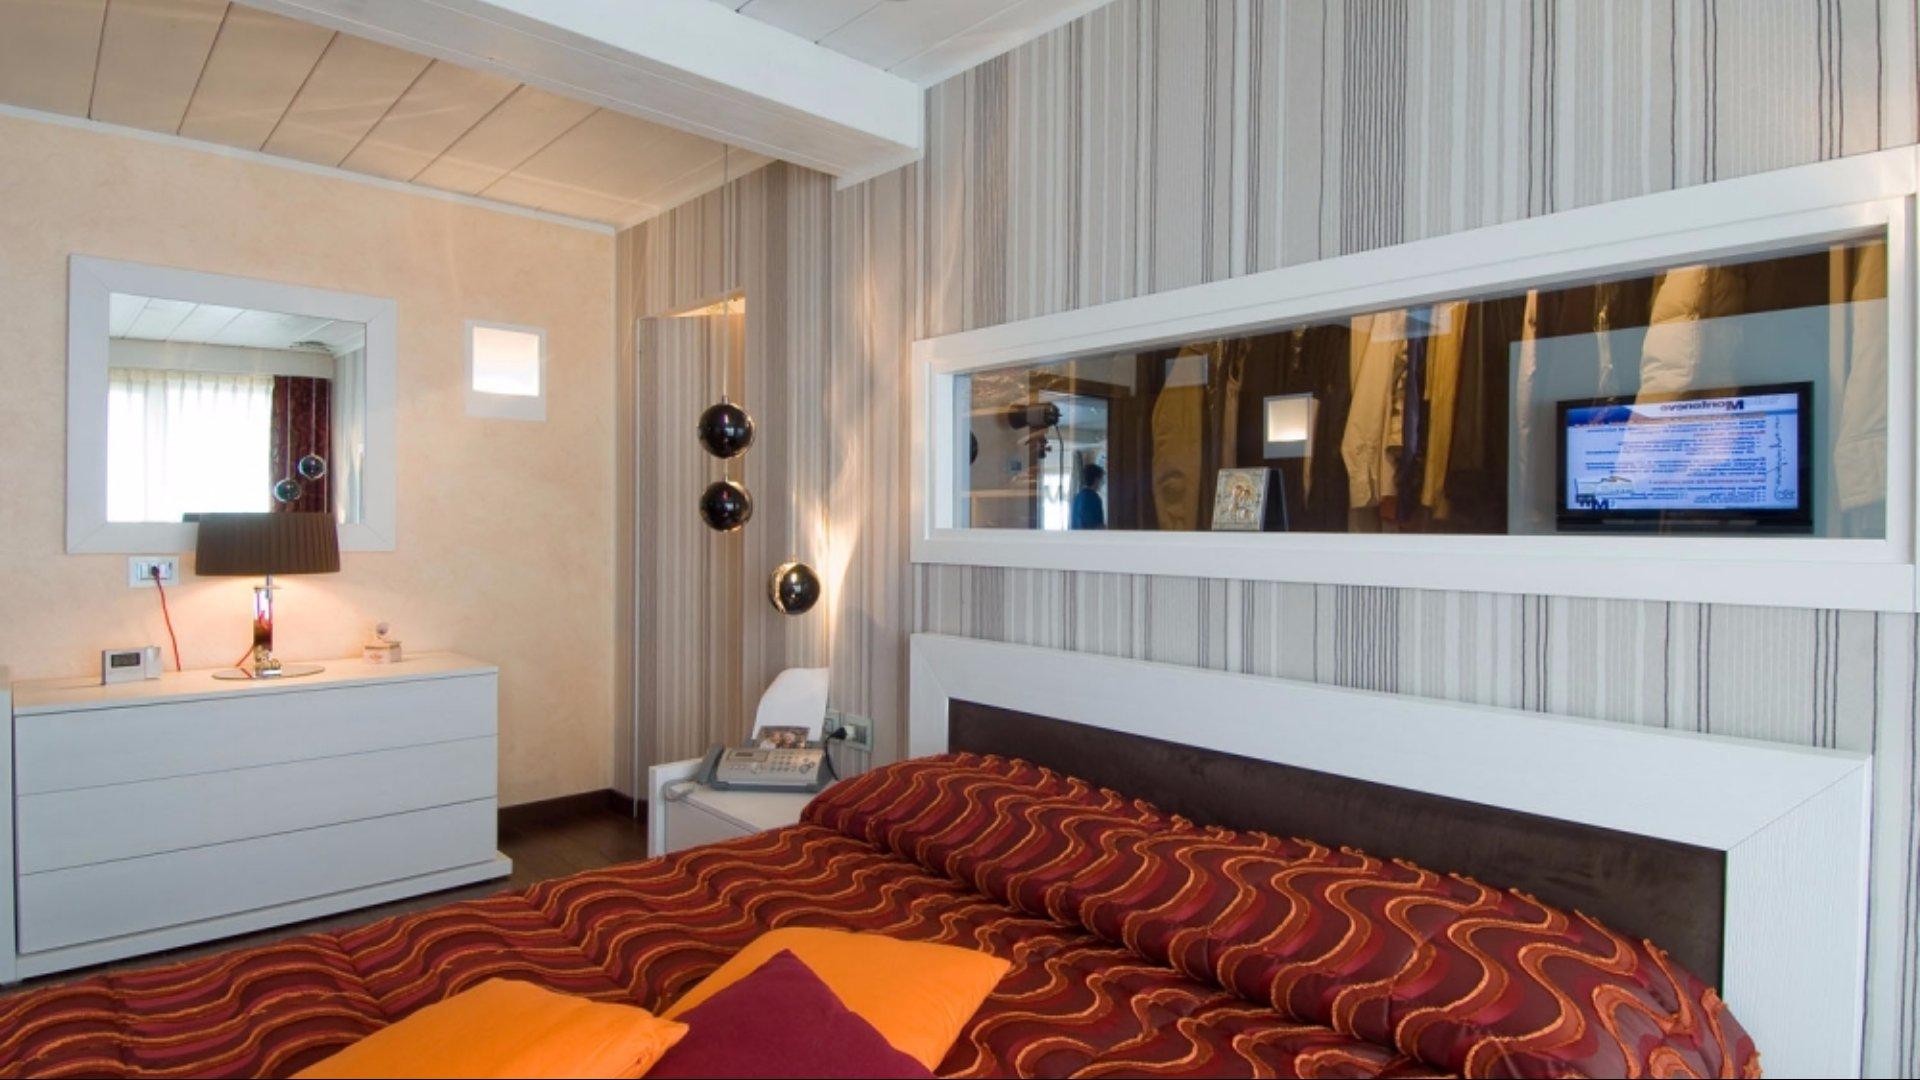 Residenza privata - Trepalle - So 11